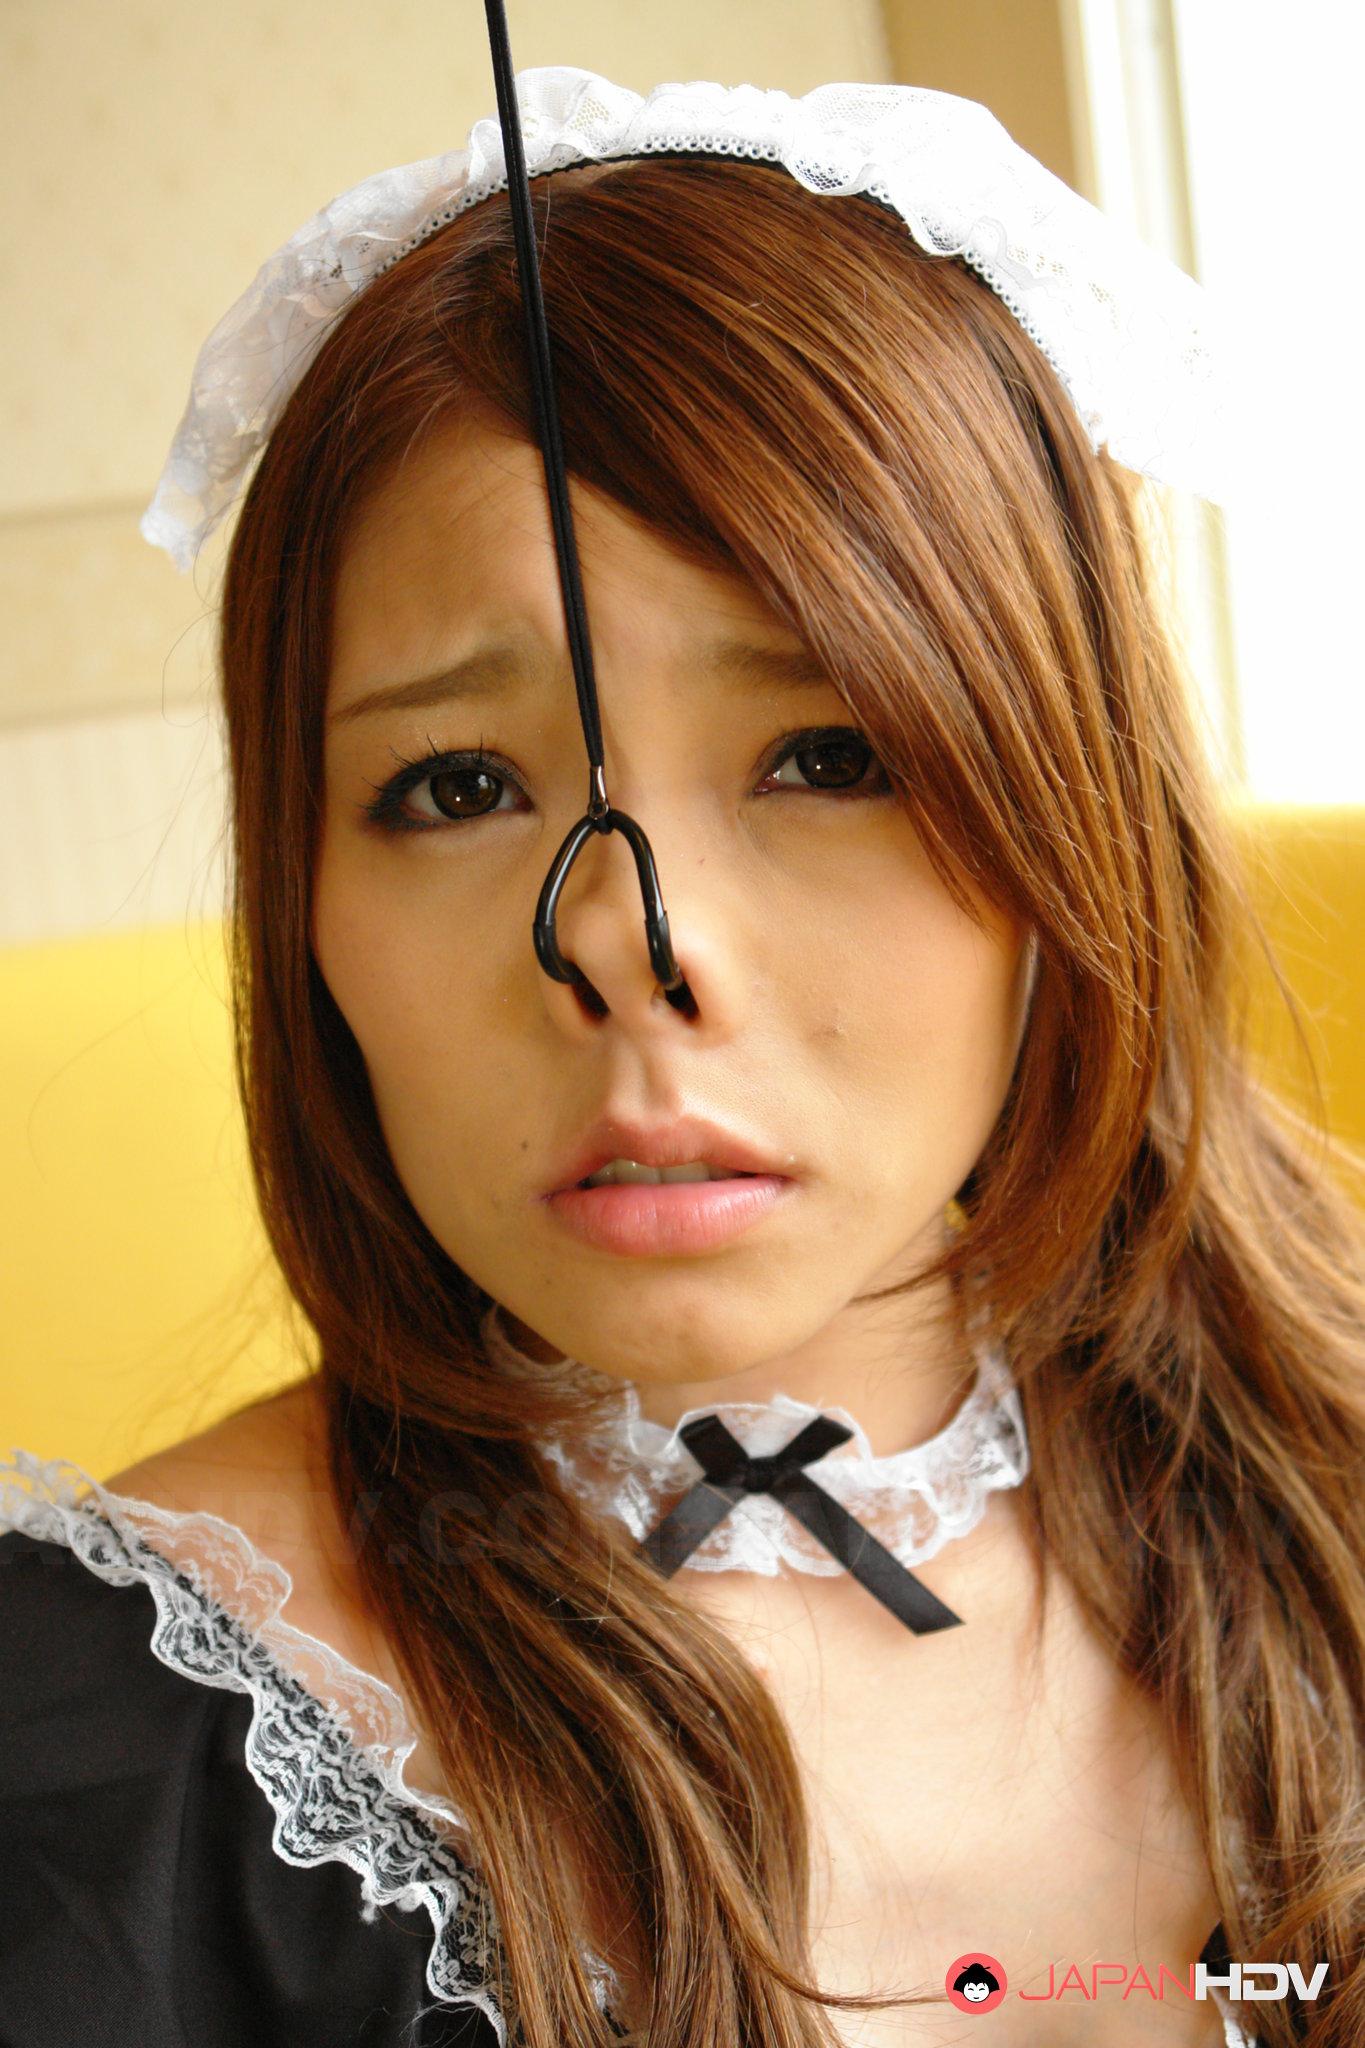 Porn pics of Amazing Japanese nose hook darling Aoi Yuki